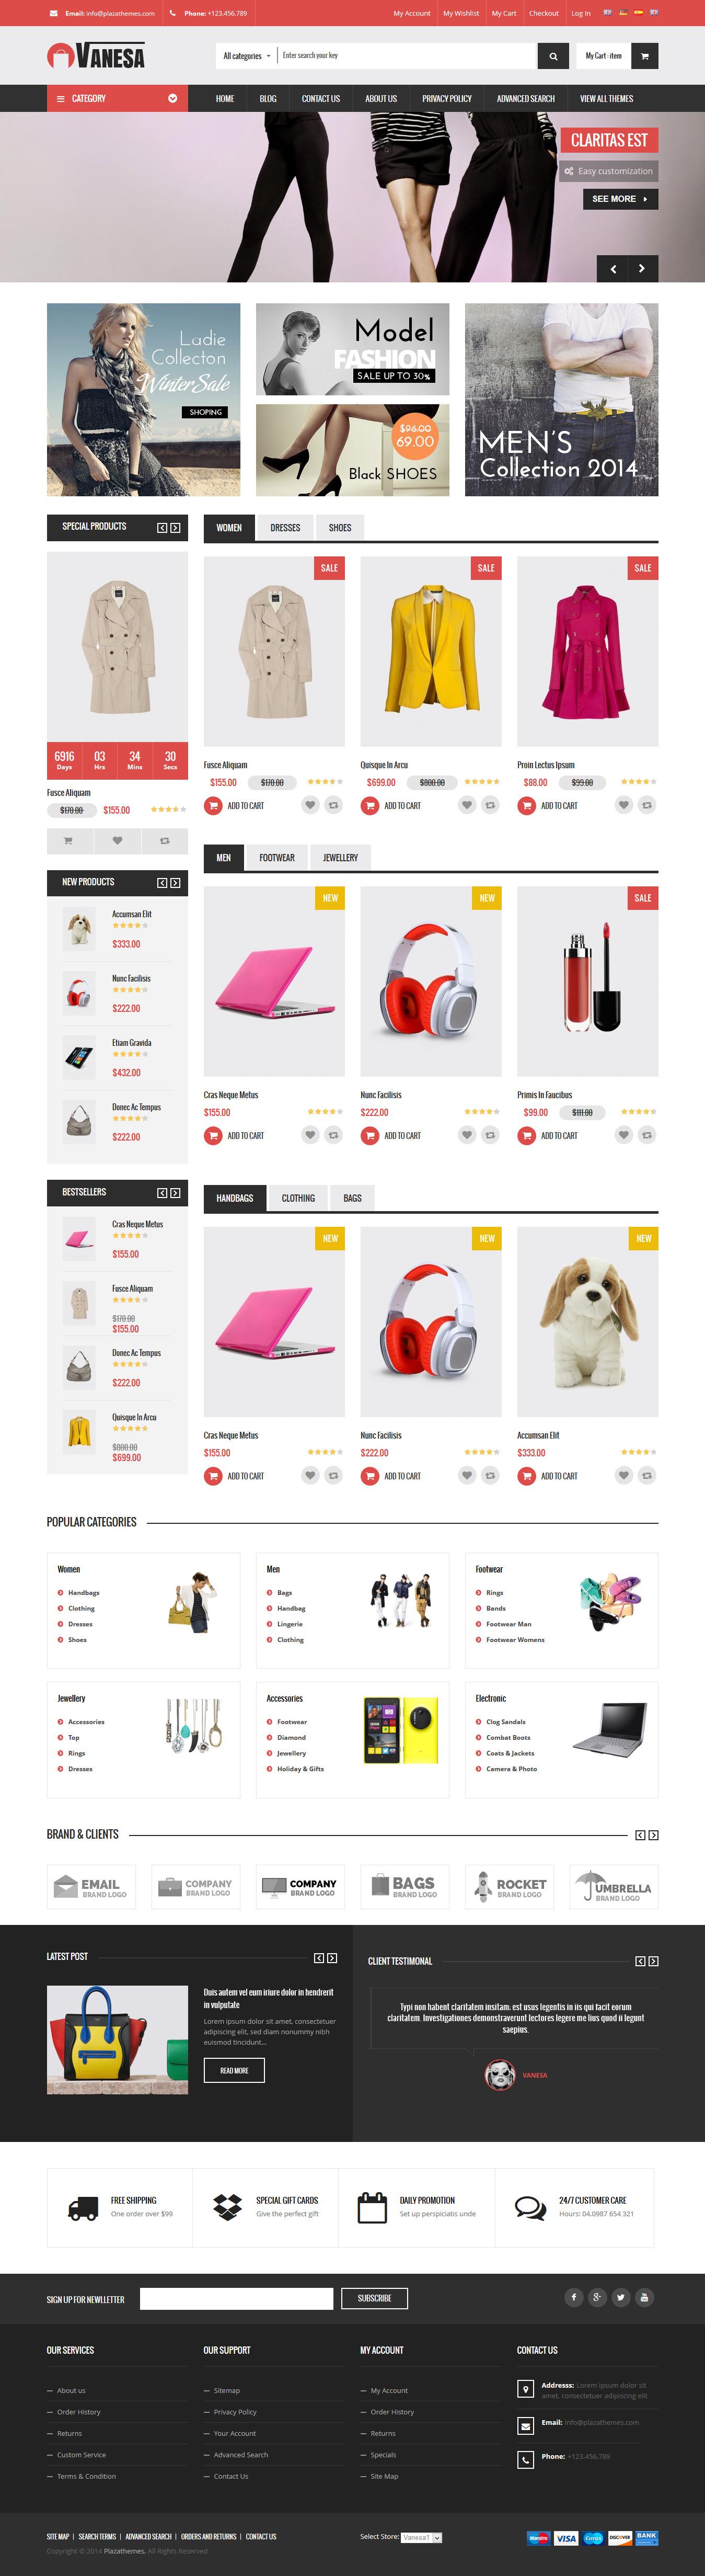 Vanesa - Mega Store Responsive Magento Theme Demo 1 #website #webshop #ecommerce Download: http://themeforest.net/item/vanesa-mega-store-responsive-magento-theme/9430758?ref=ksioks